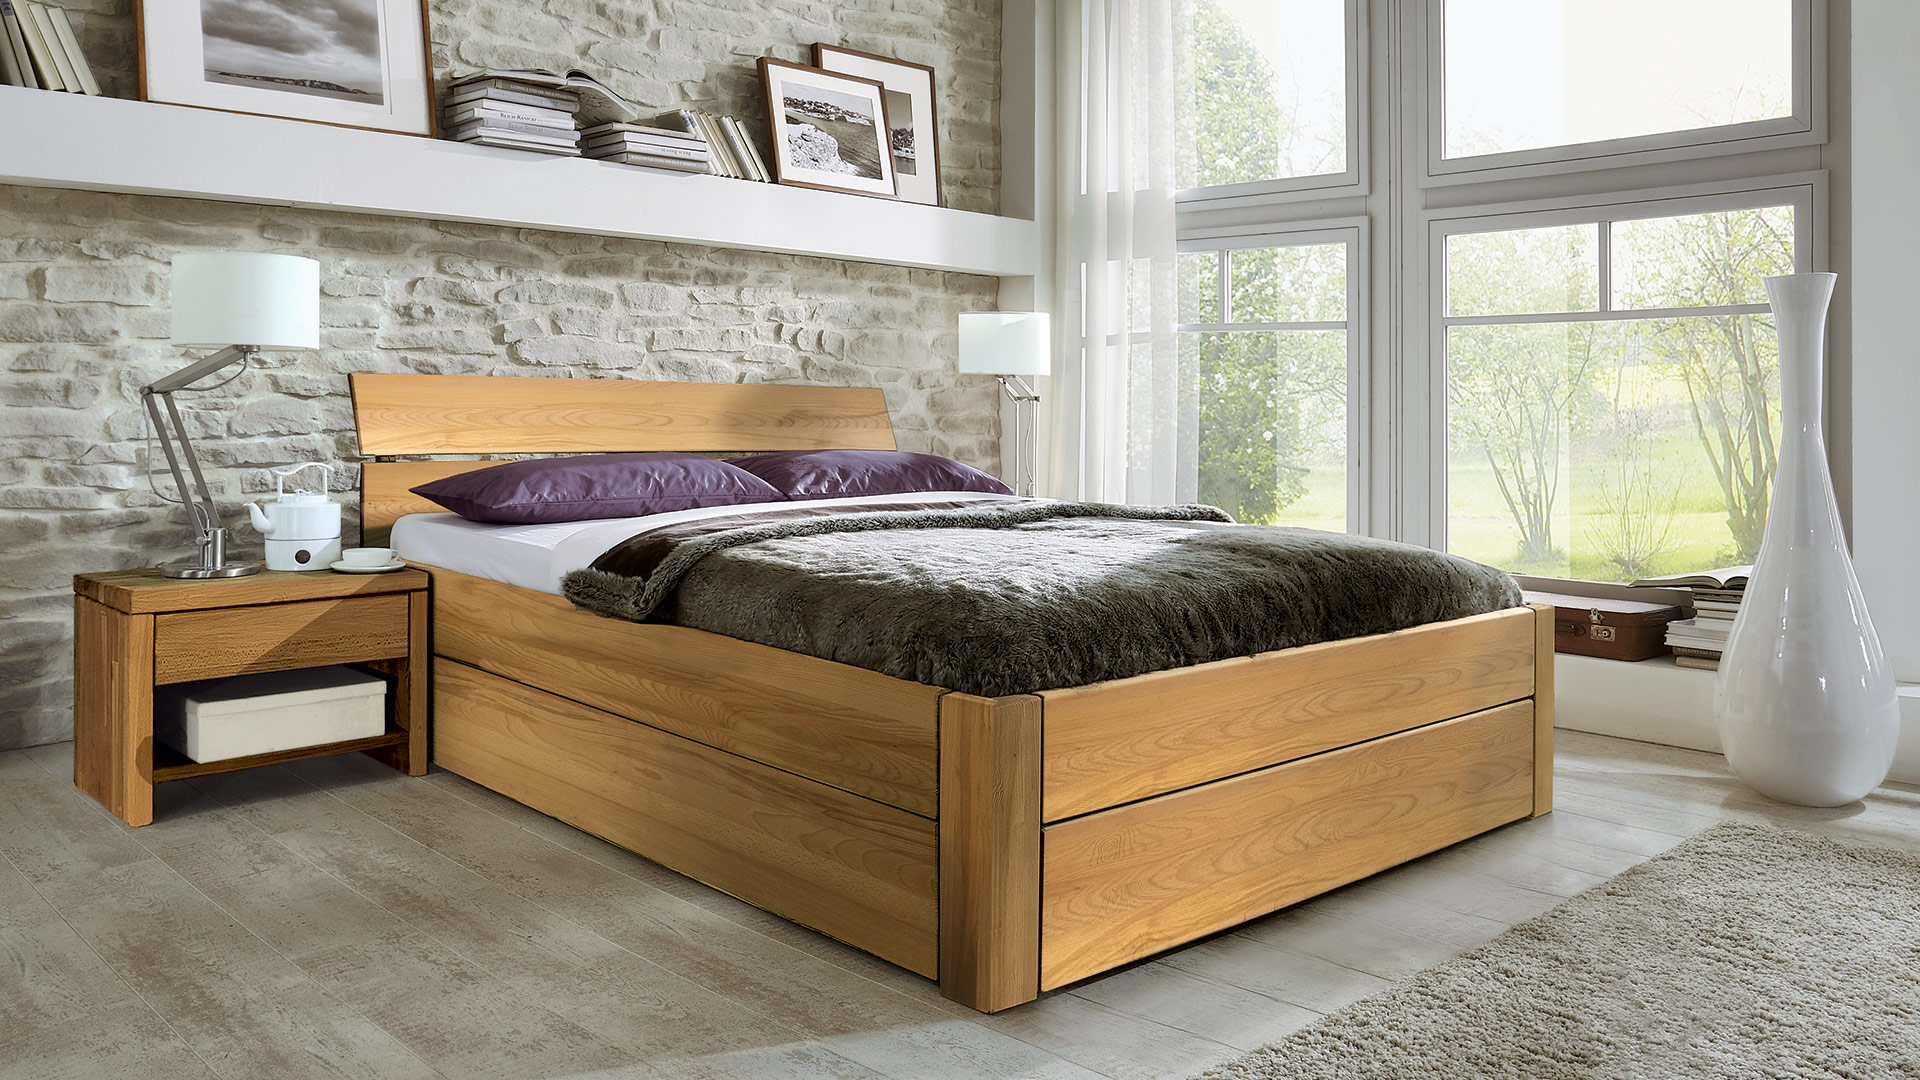 schubkastenbett sobaria. Black Bedroom Furniture Sets. Home Design Ideas